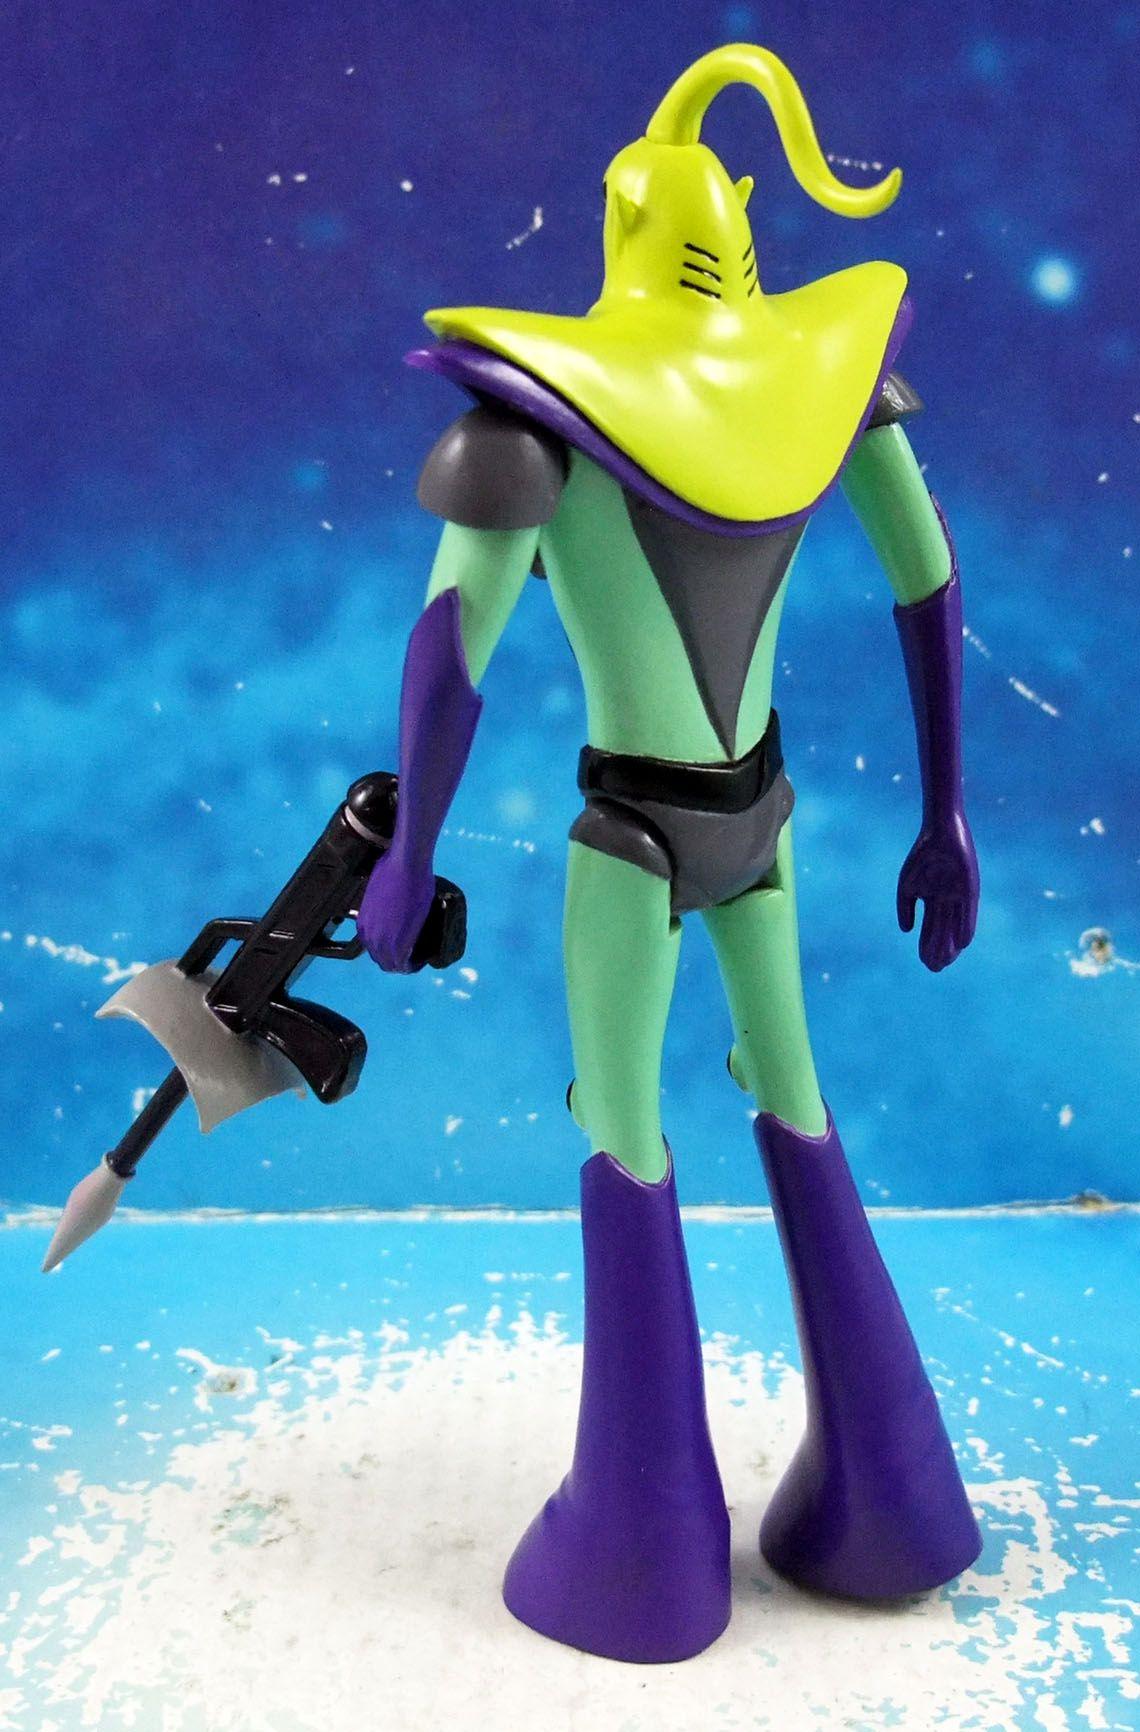 Goldorak - FT02 Soldat de Véga (Vegan Soldier) - Figurine articulée Frankentoys